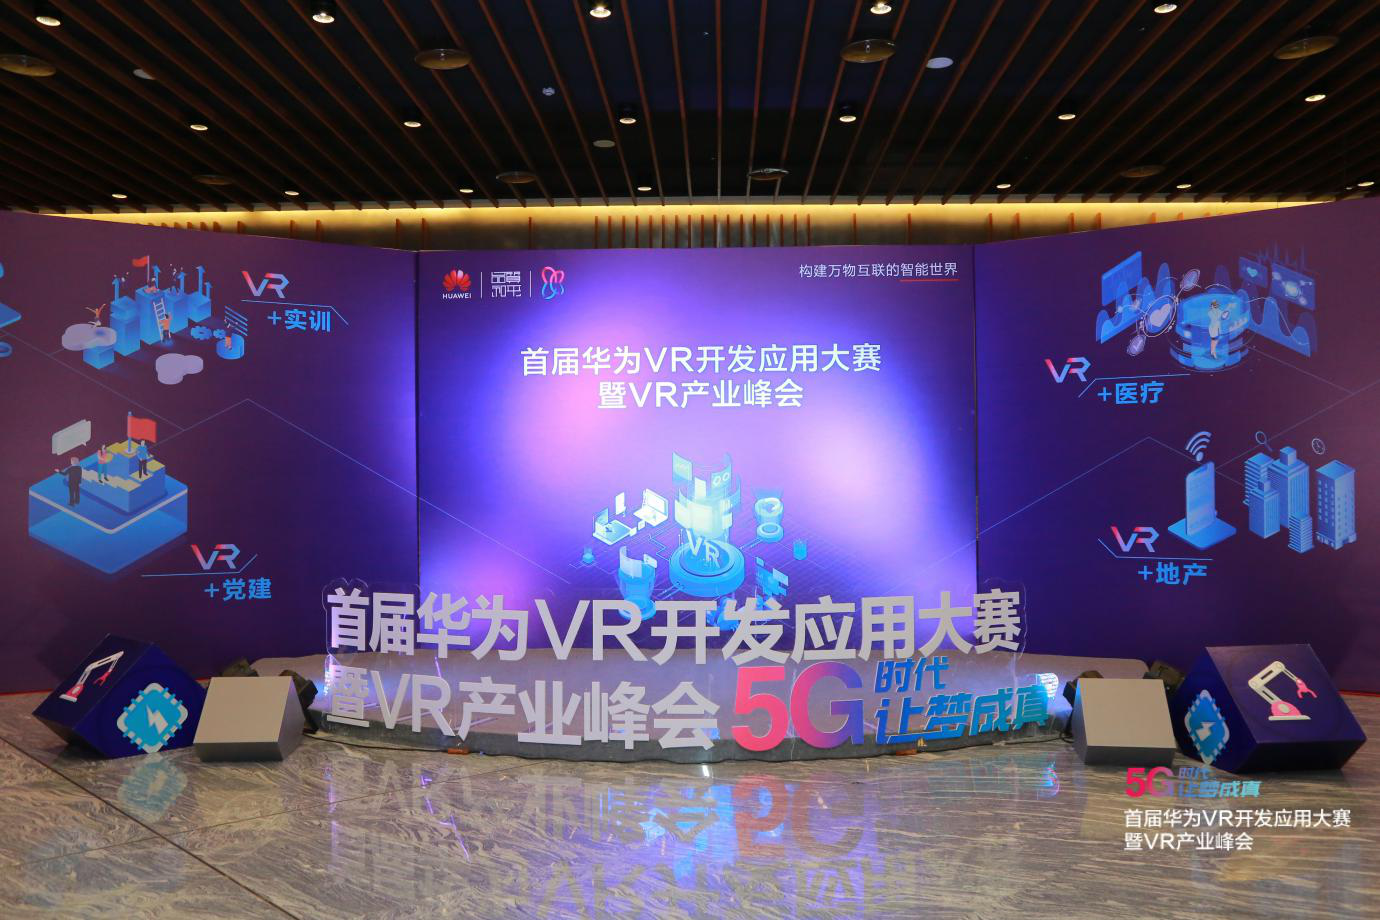 5G+VR助力数字经济,首届华为VR开发应用大赛总决赛暨VR产业峰会圆满落幕